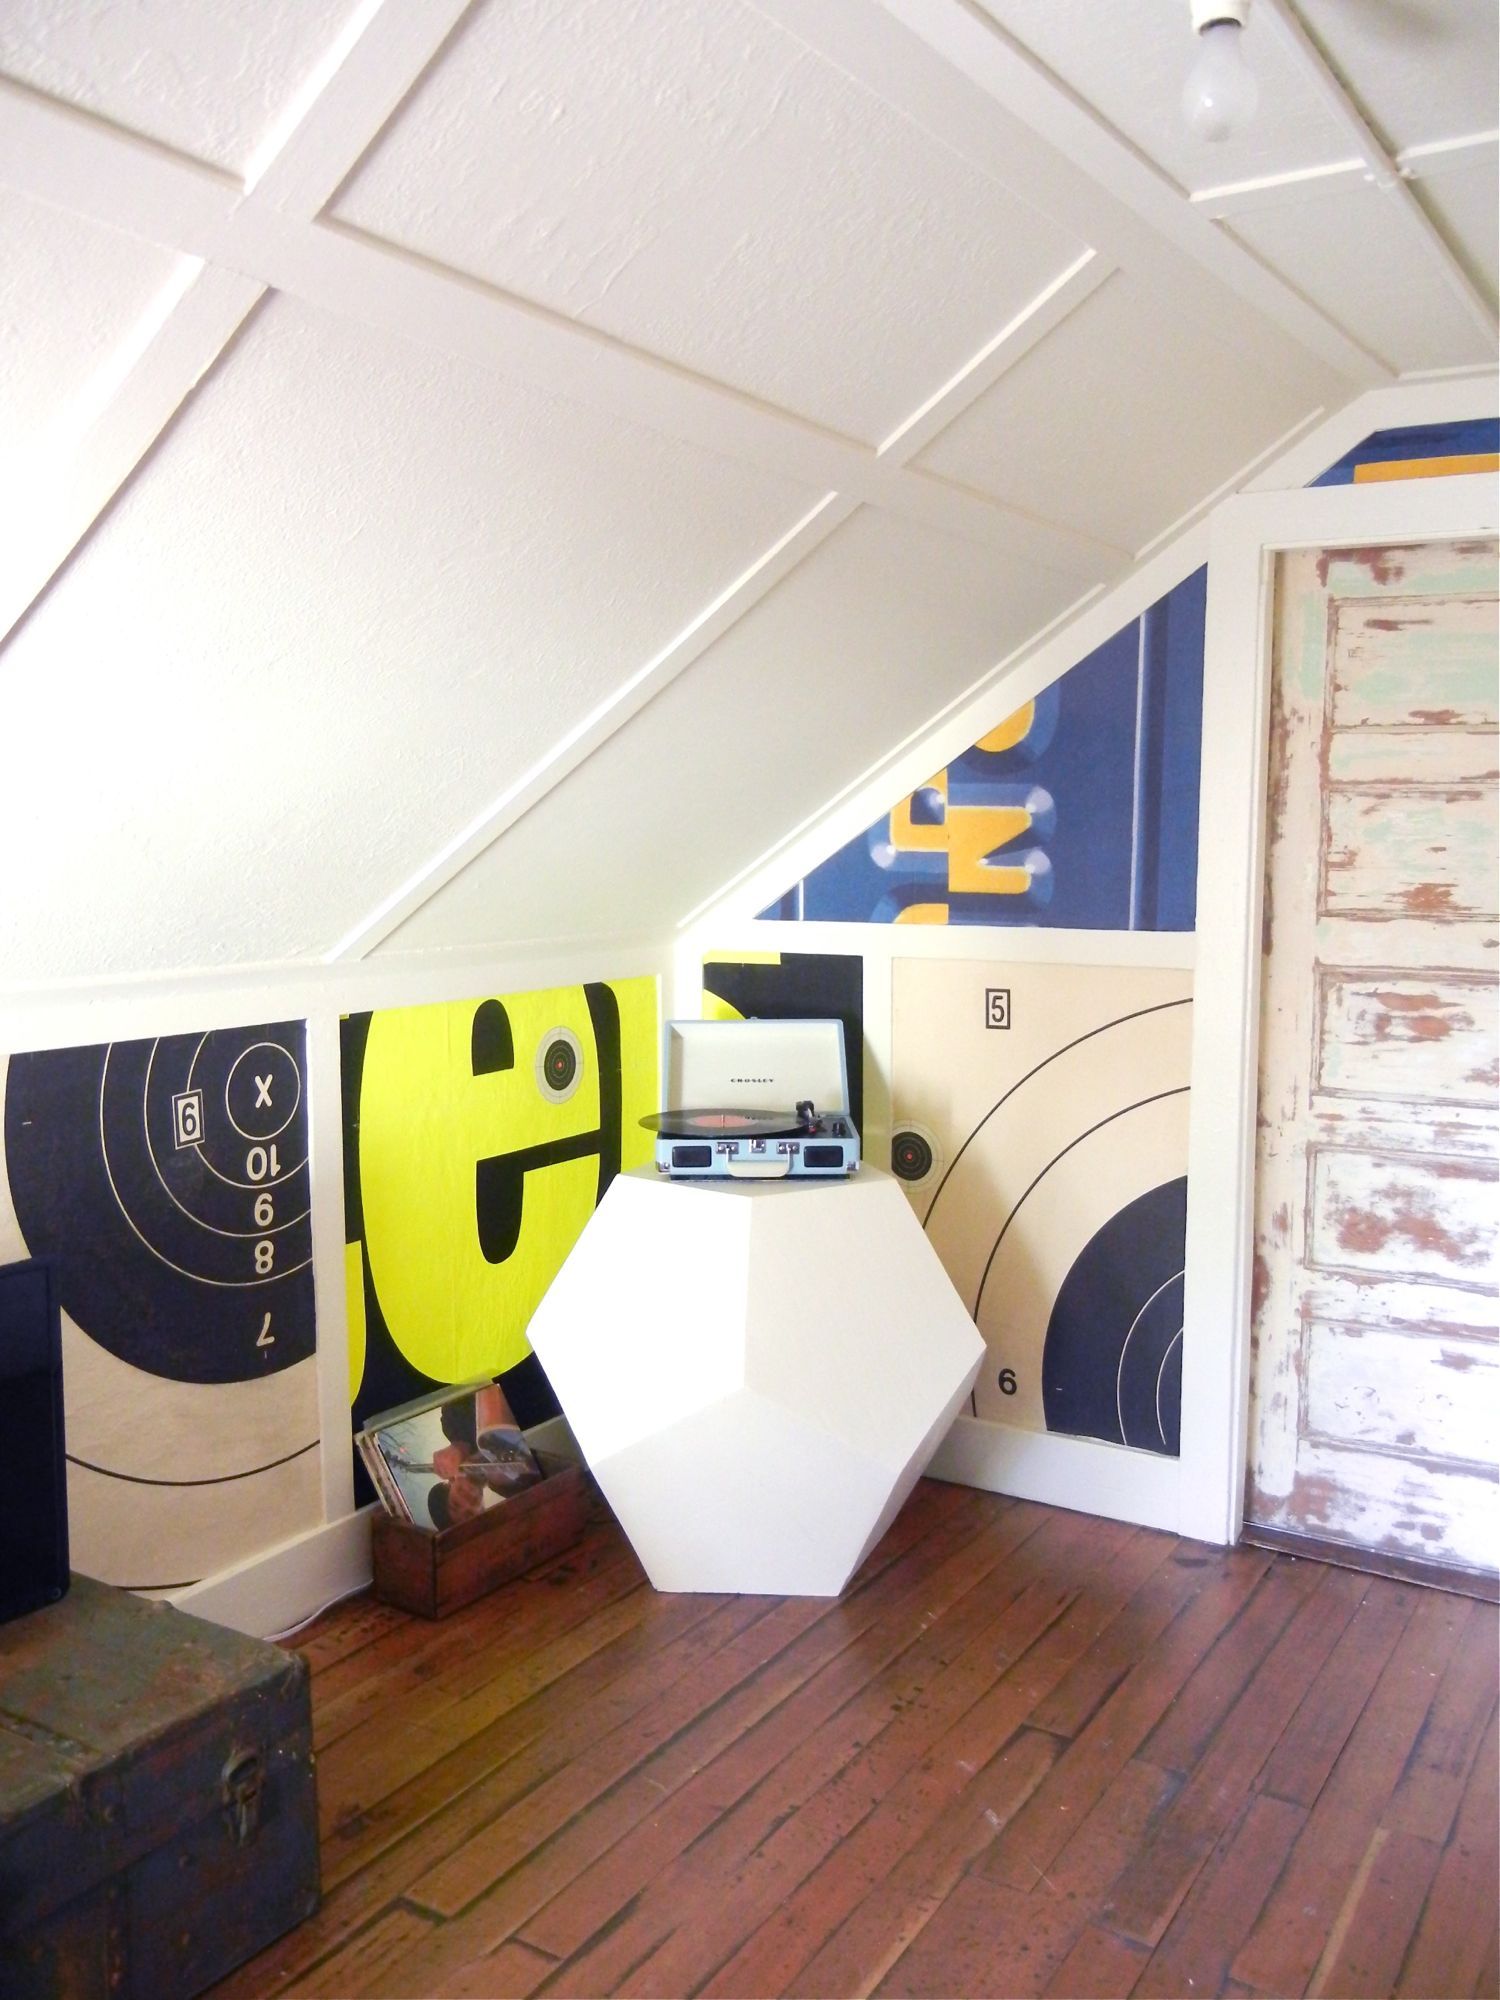 Jasper Johns Room